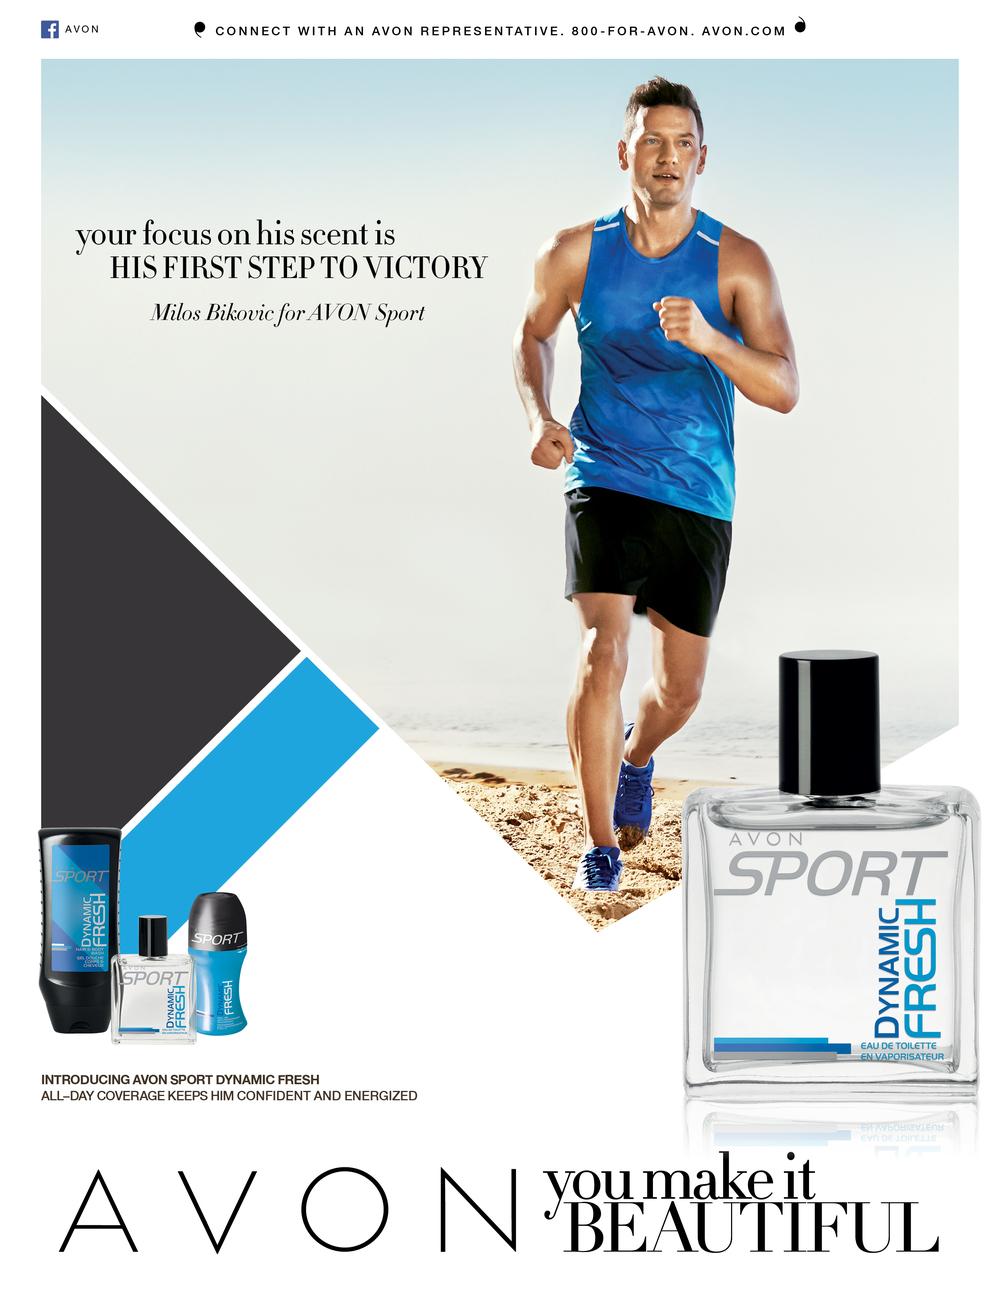 AVON_Sport_Print_Single_041014_Serbia_updated.jpg